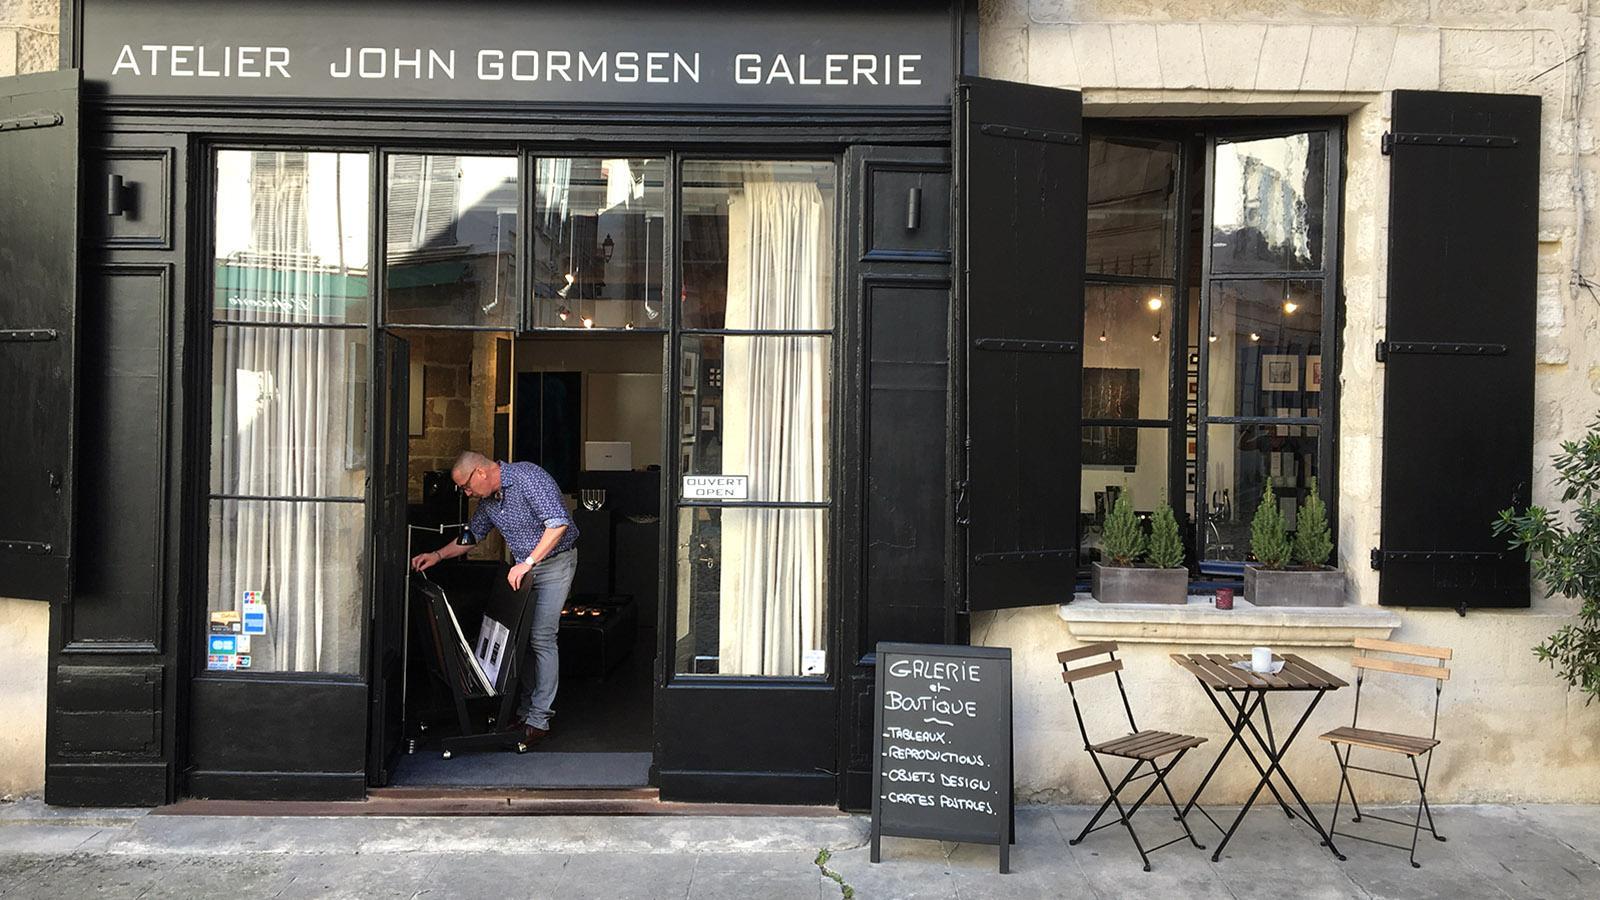 Die Galerie John Gormsen residiert an der charmanten Place Saint-Pierre. Foto: Hilke Maunder